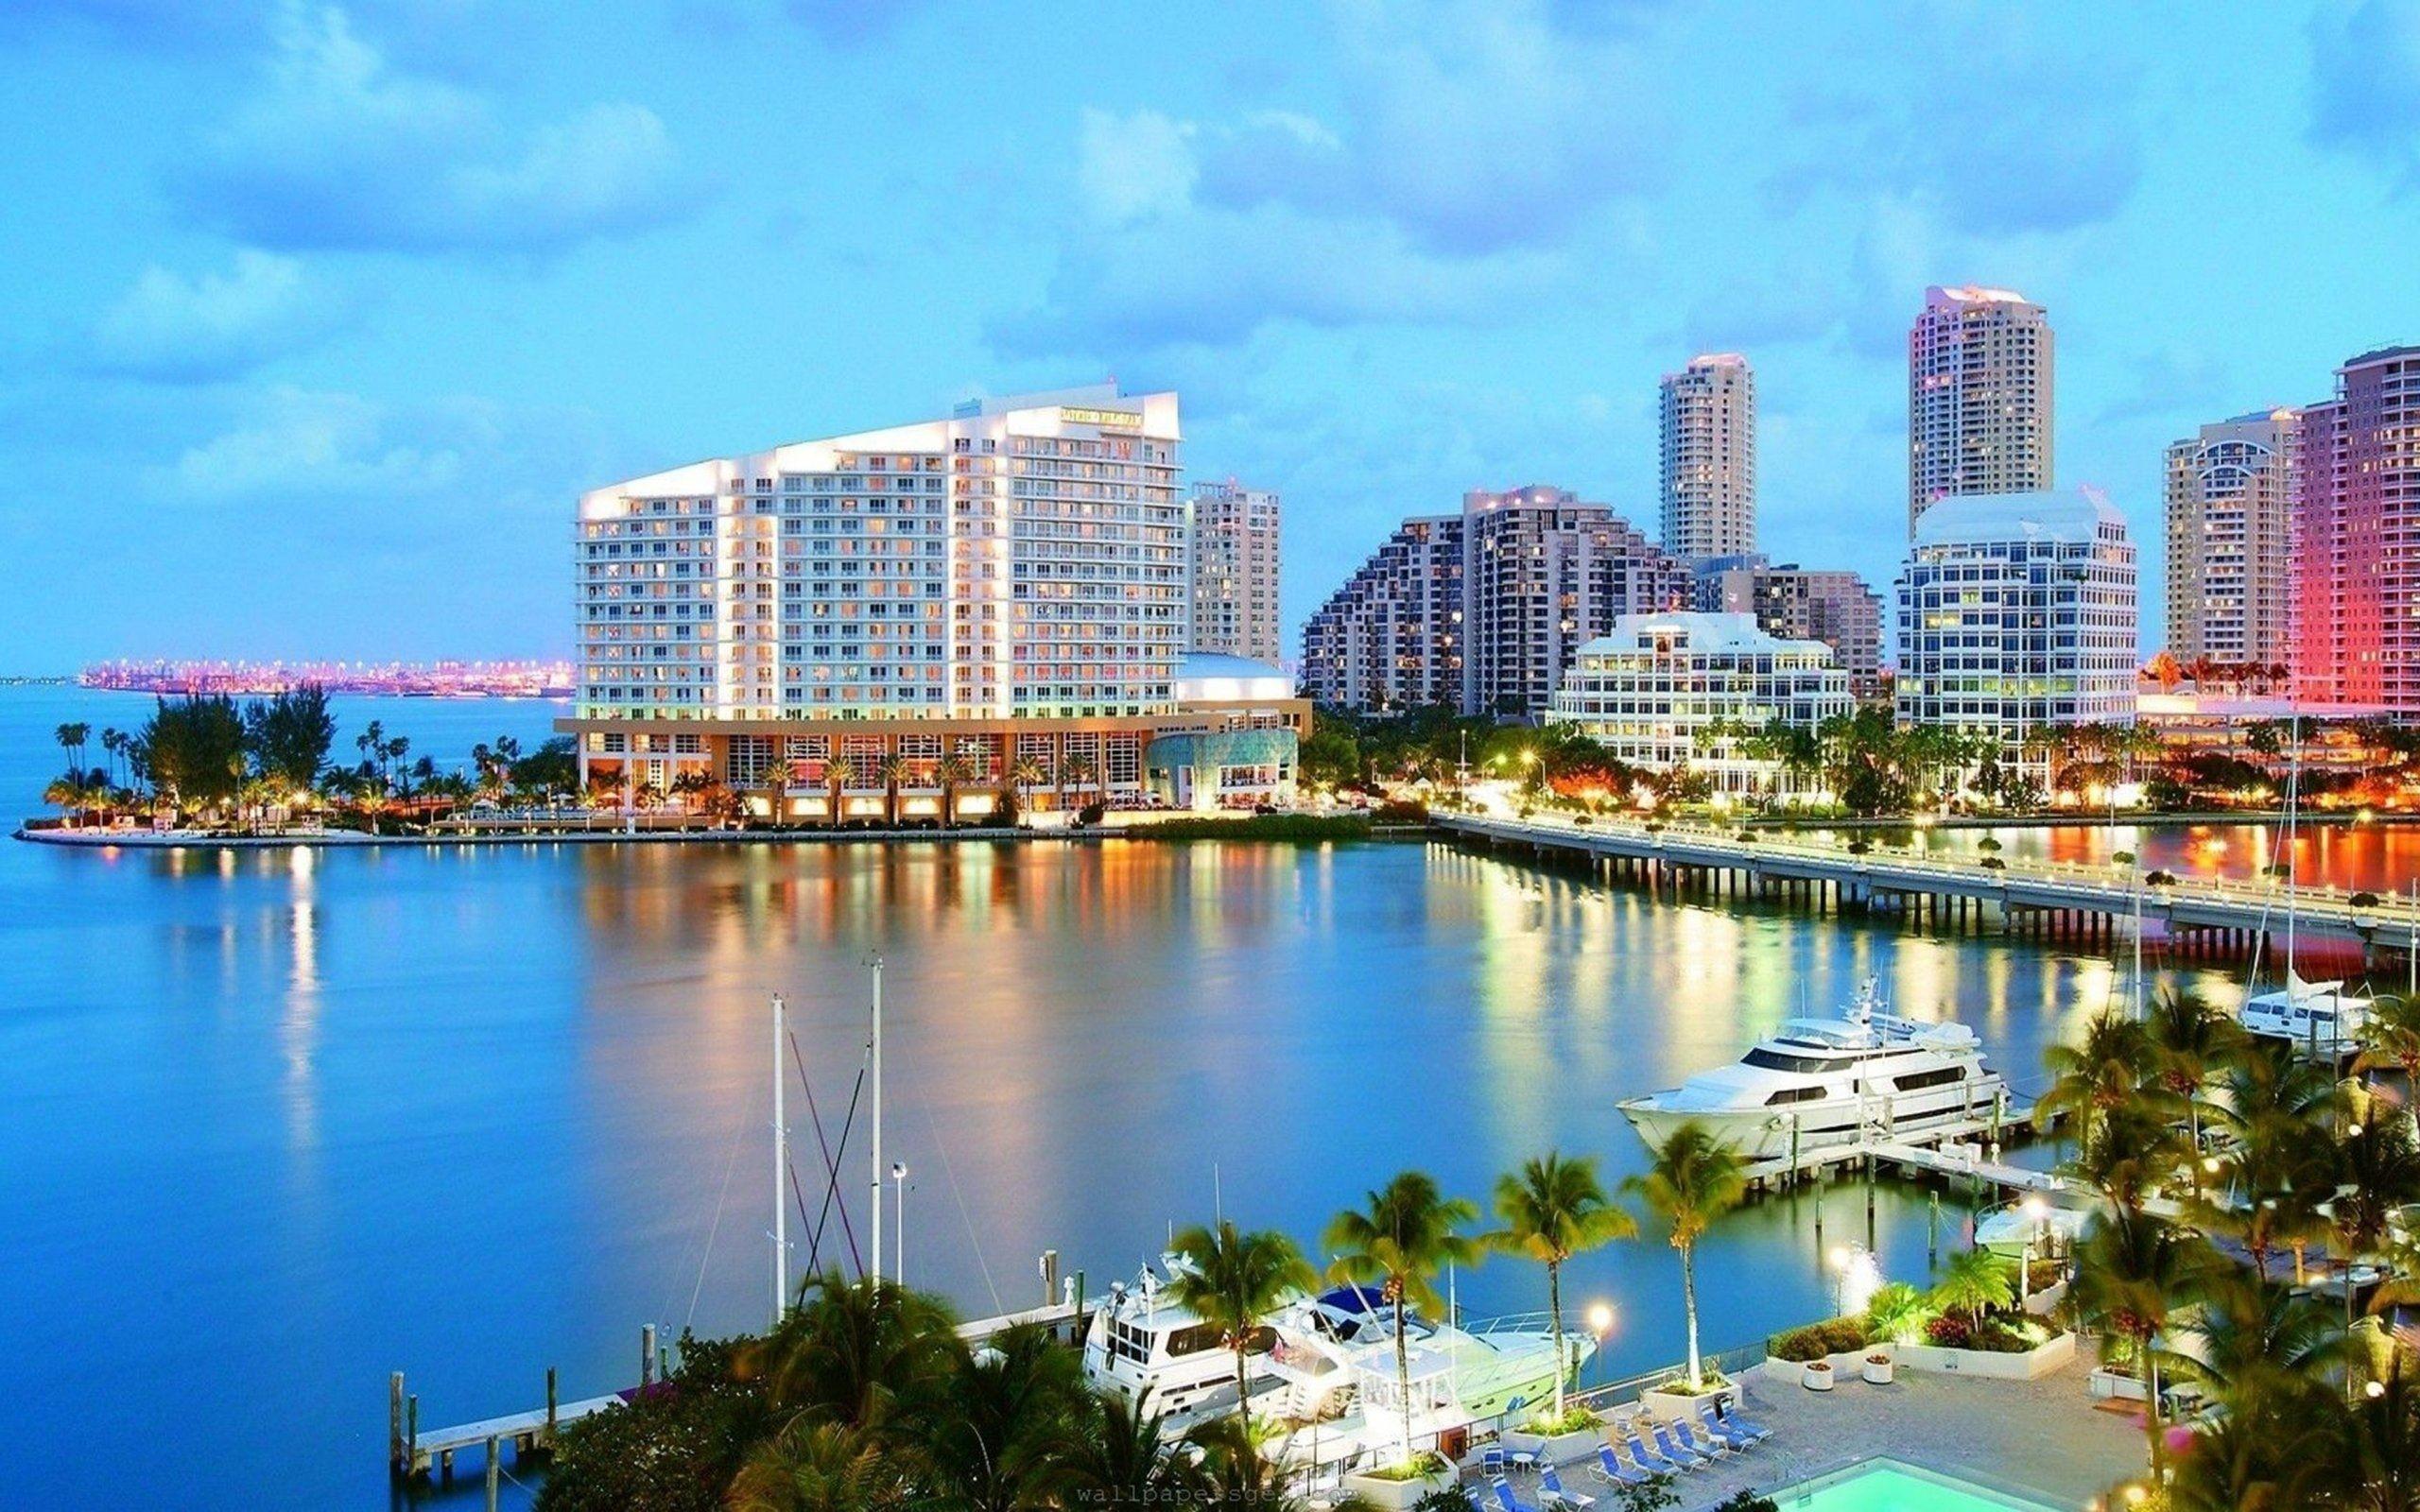 2560x1600 Florida Beaches Sunset Wallpaper Background 1 HD Wallpapers